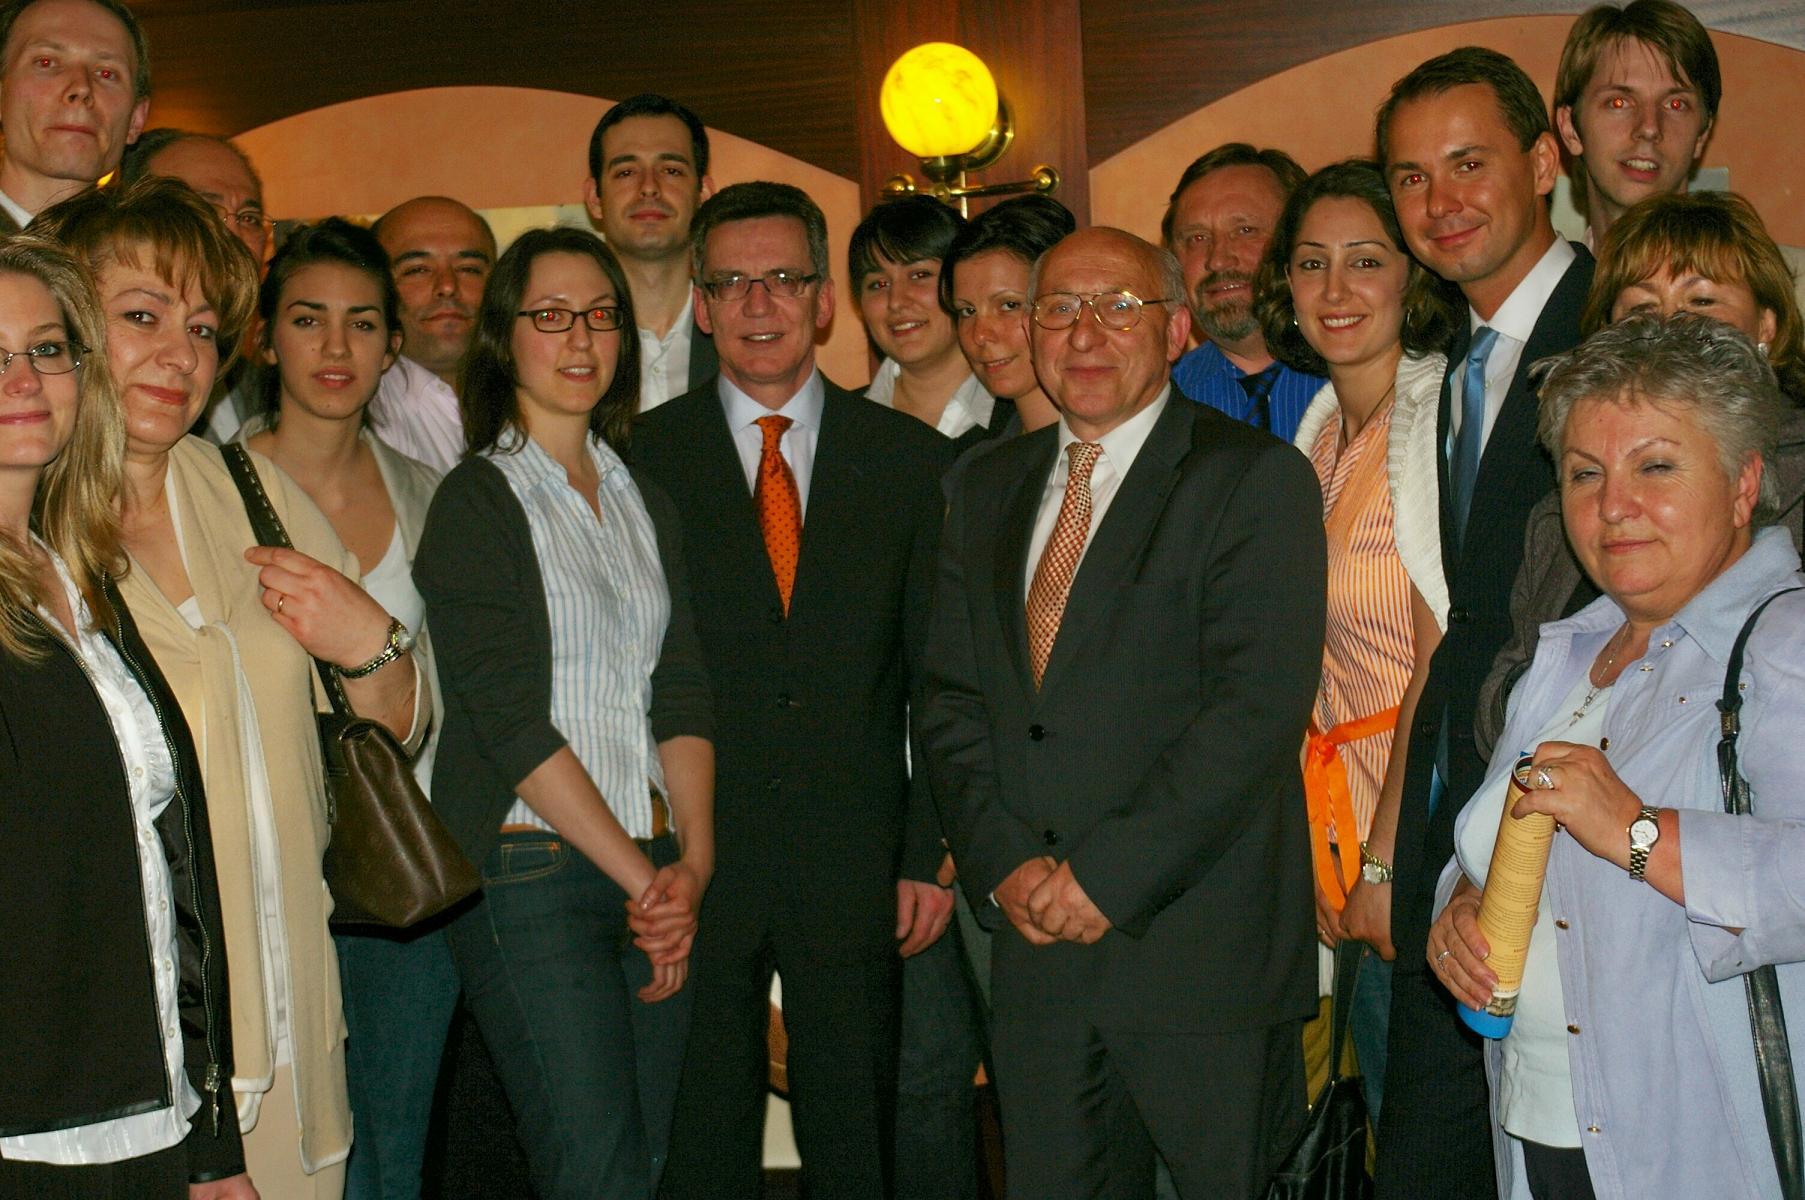 CDU-Fraktion Kreuzberg-Friedrichshain mit Verteidigungsminister Thomas de Maizière